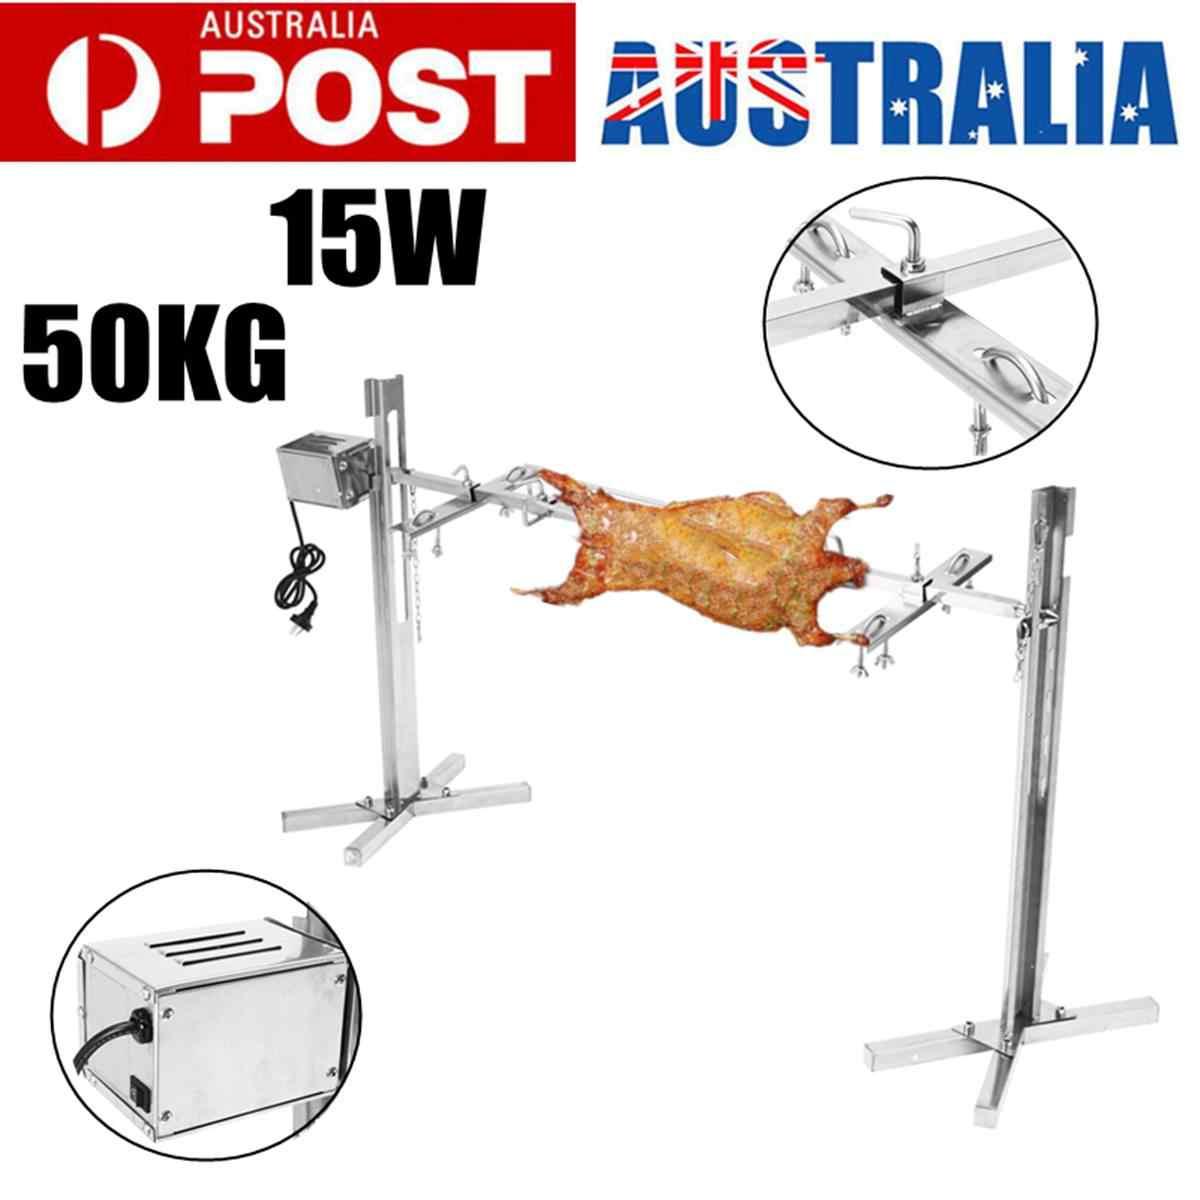 15 W AU Listrik Otomatis BBQ Grill Outdoor Camping Rotisserie Motor Panggang Cabang Logam Meludah Roaster Batang Arang Ayam Babi